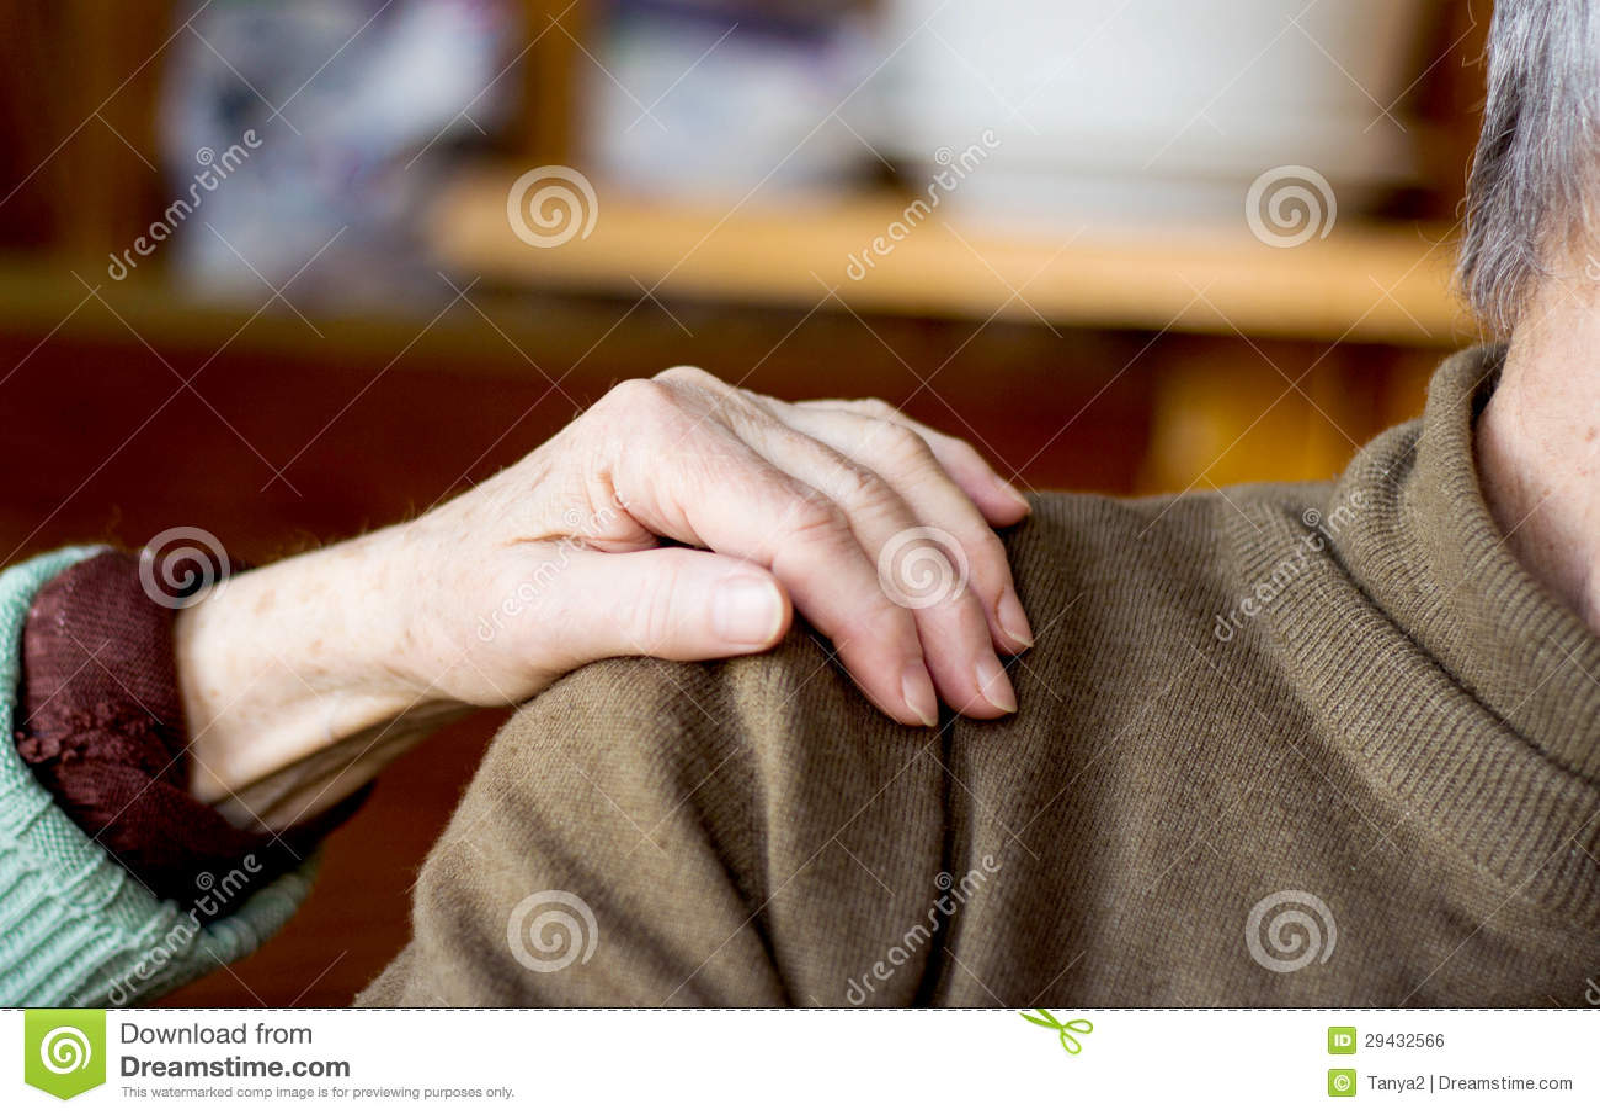 devushka-parnyu-rukami